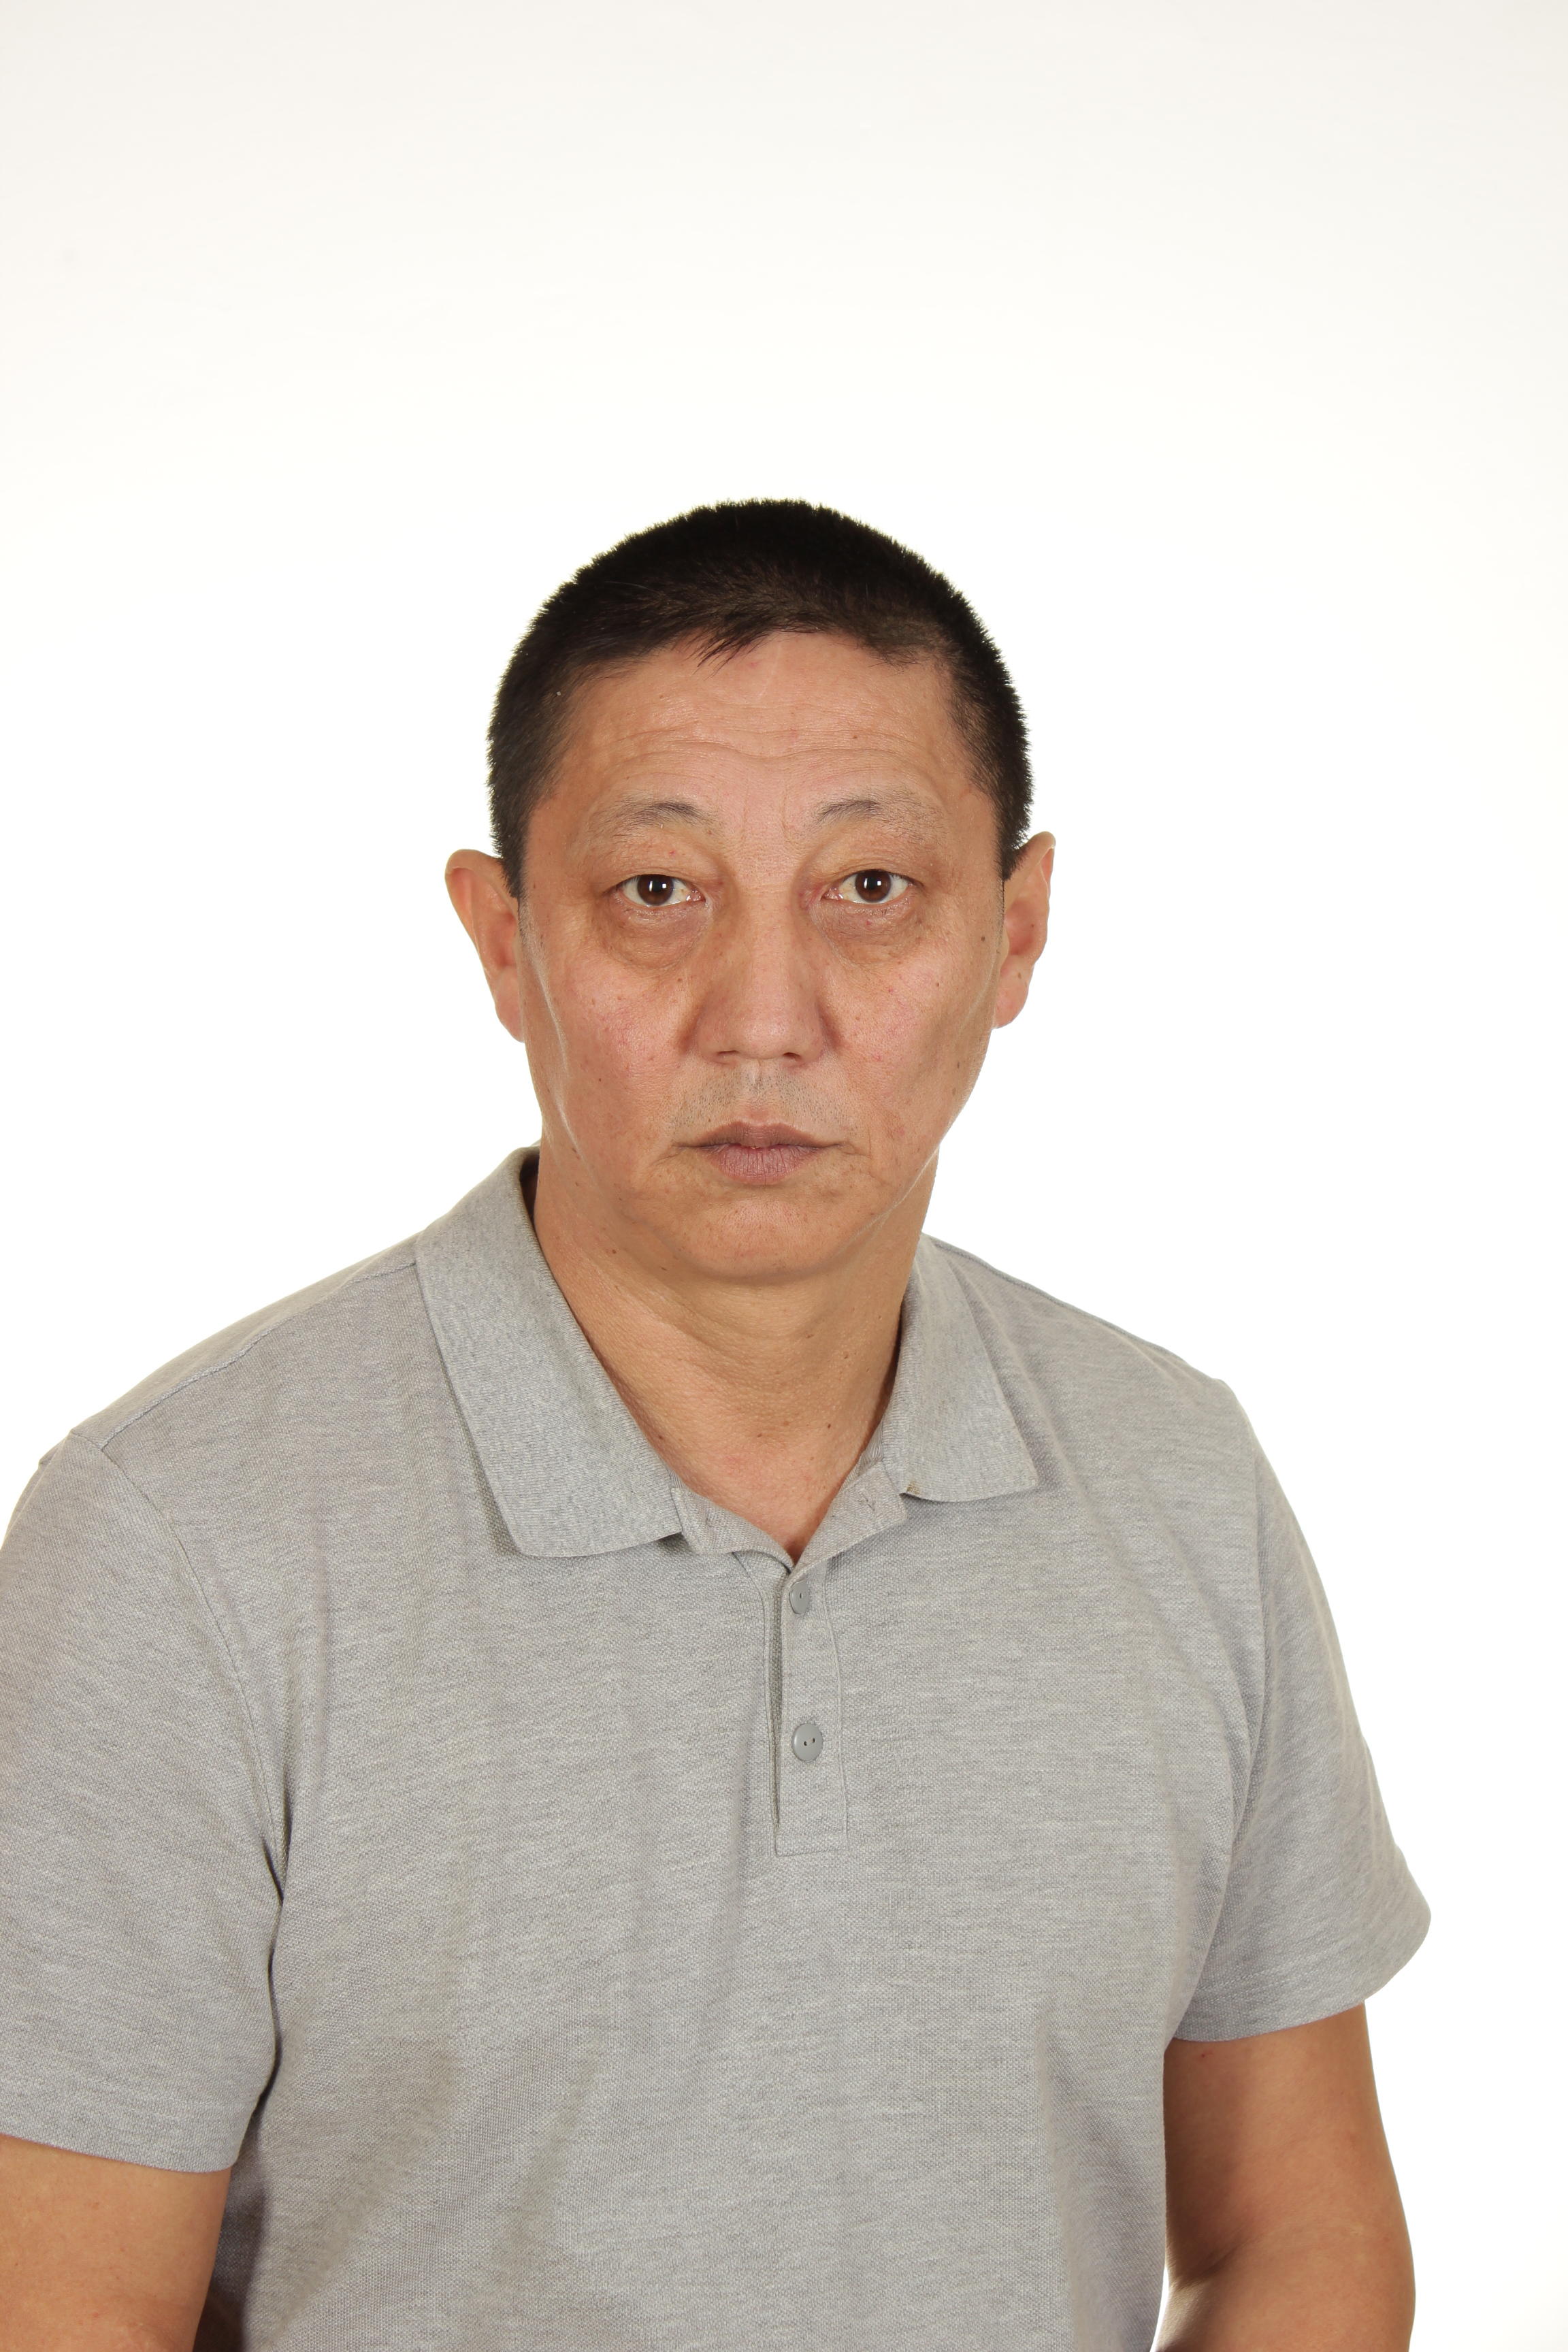 Шаупкелов Марат Аманбаевич Директор МБУДО ДЮСШ ЗАТО Комаровский